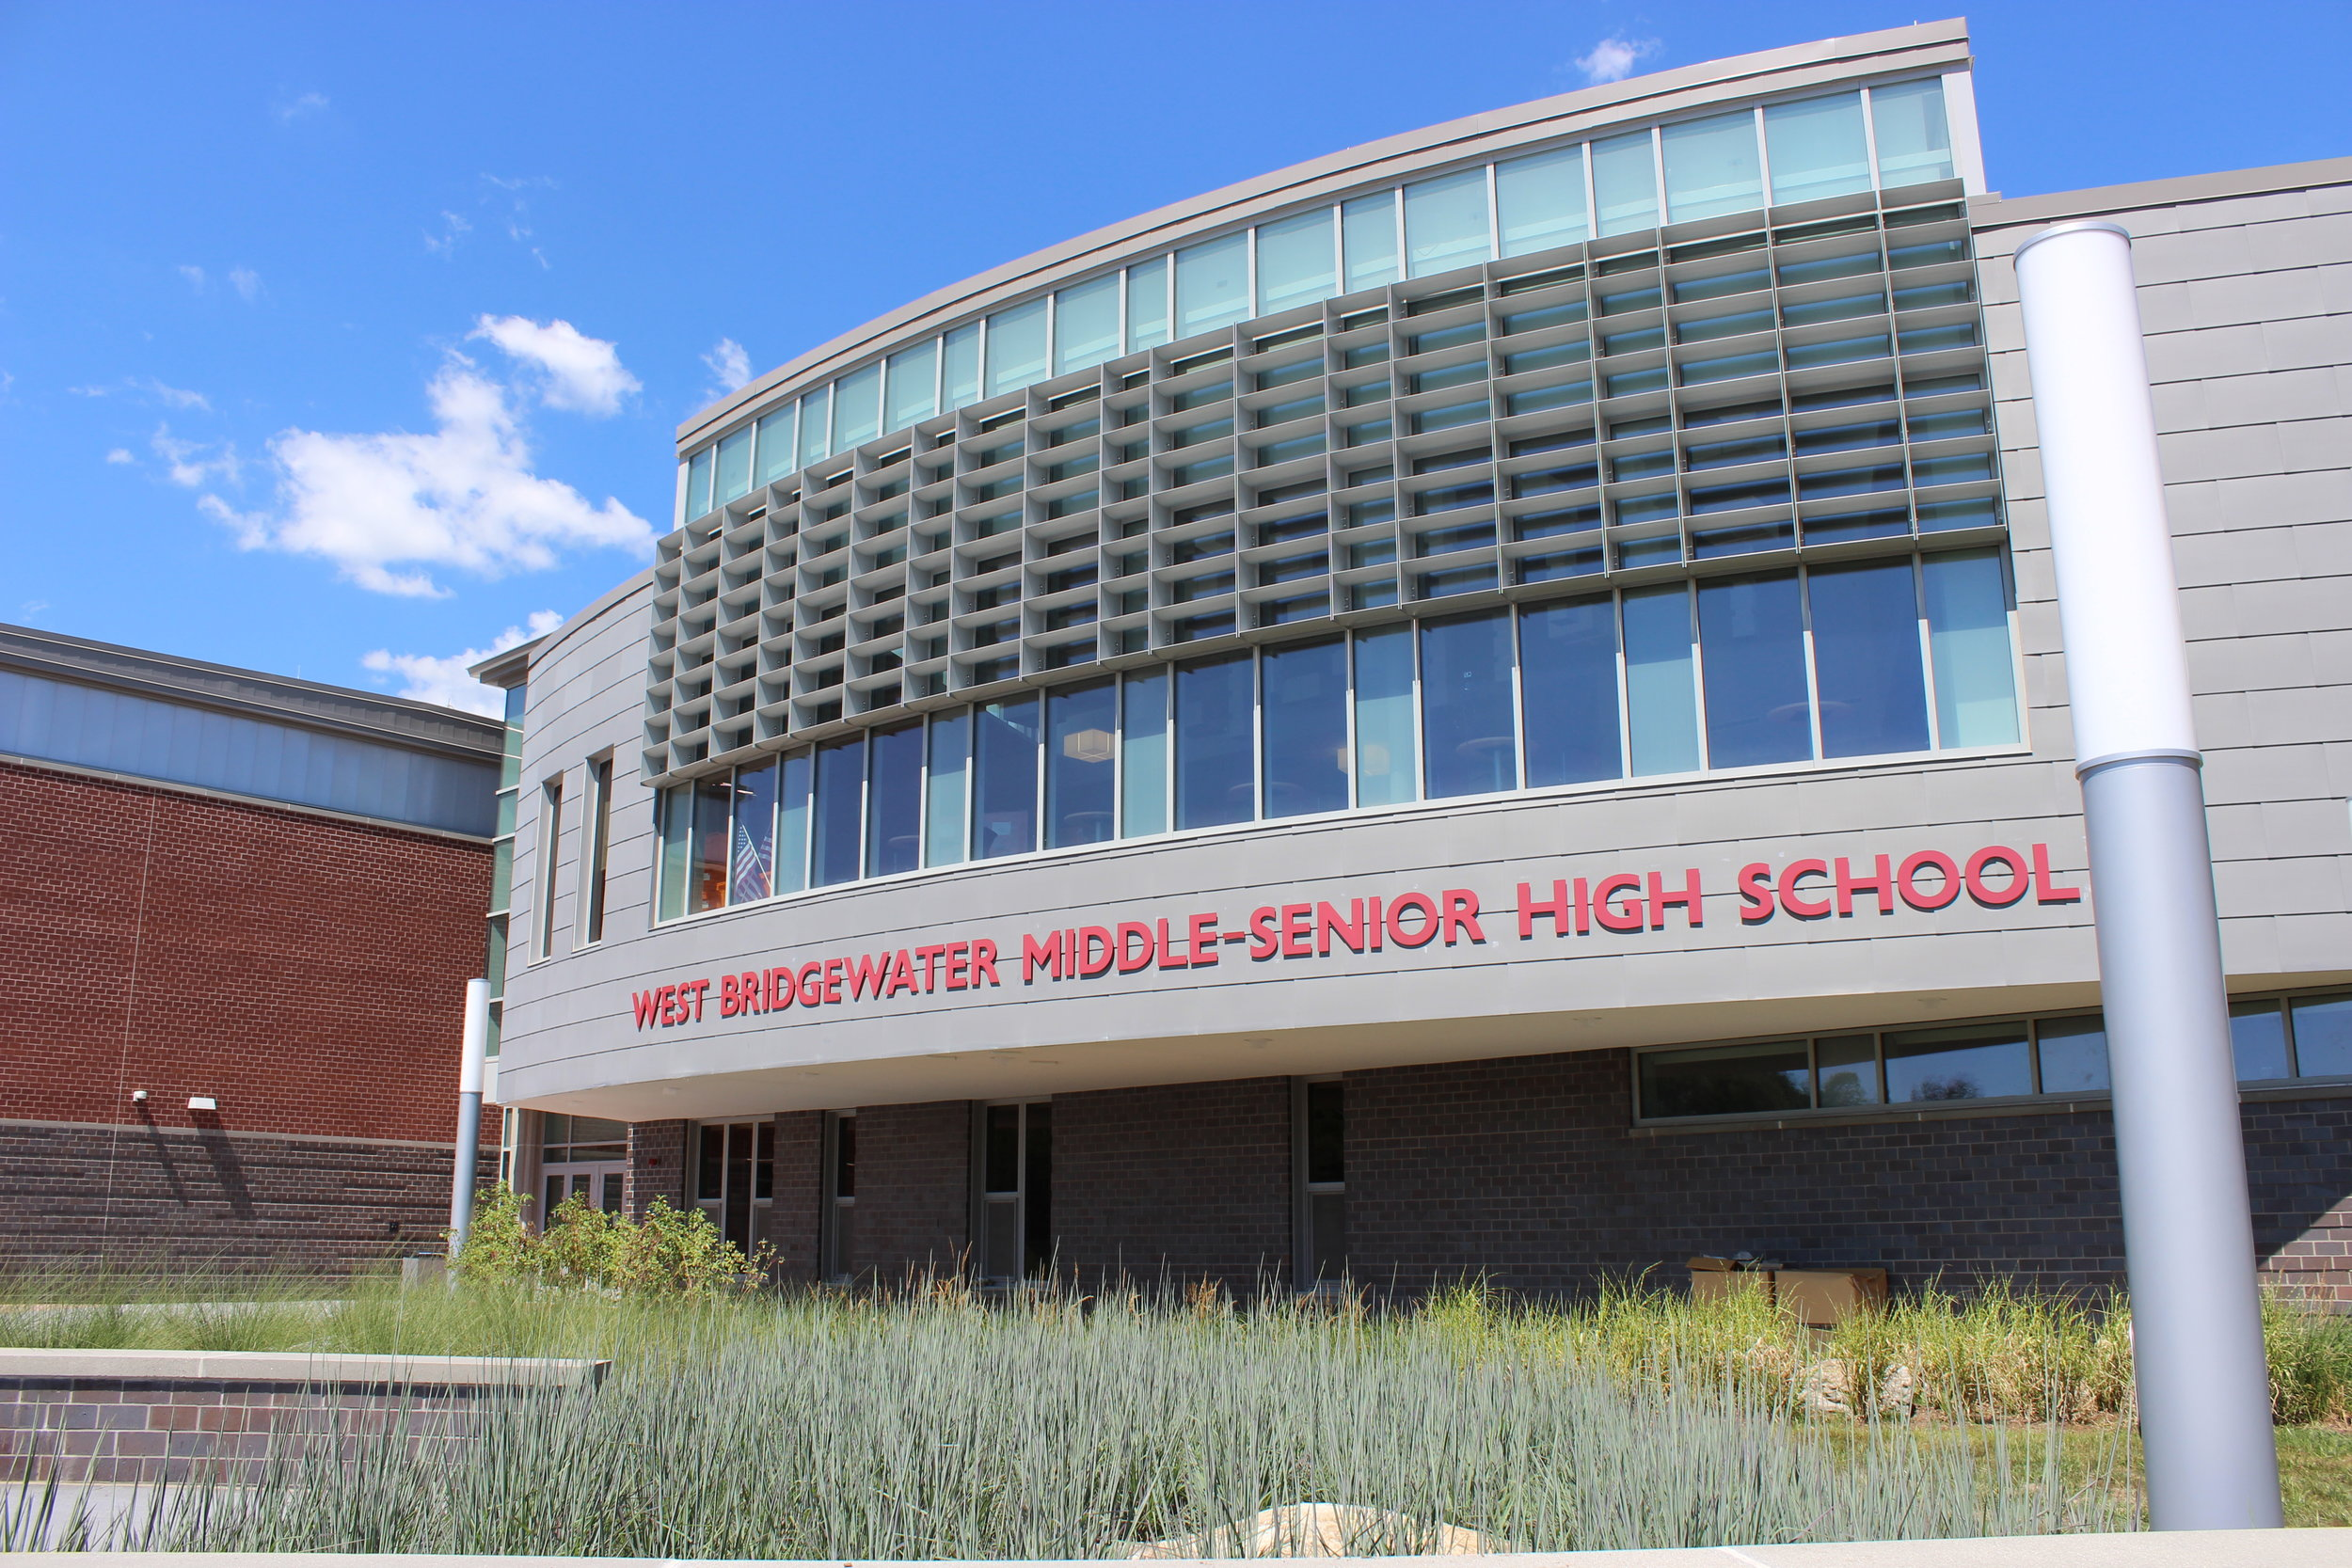 West Bridgewater Middle-Senior High School